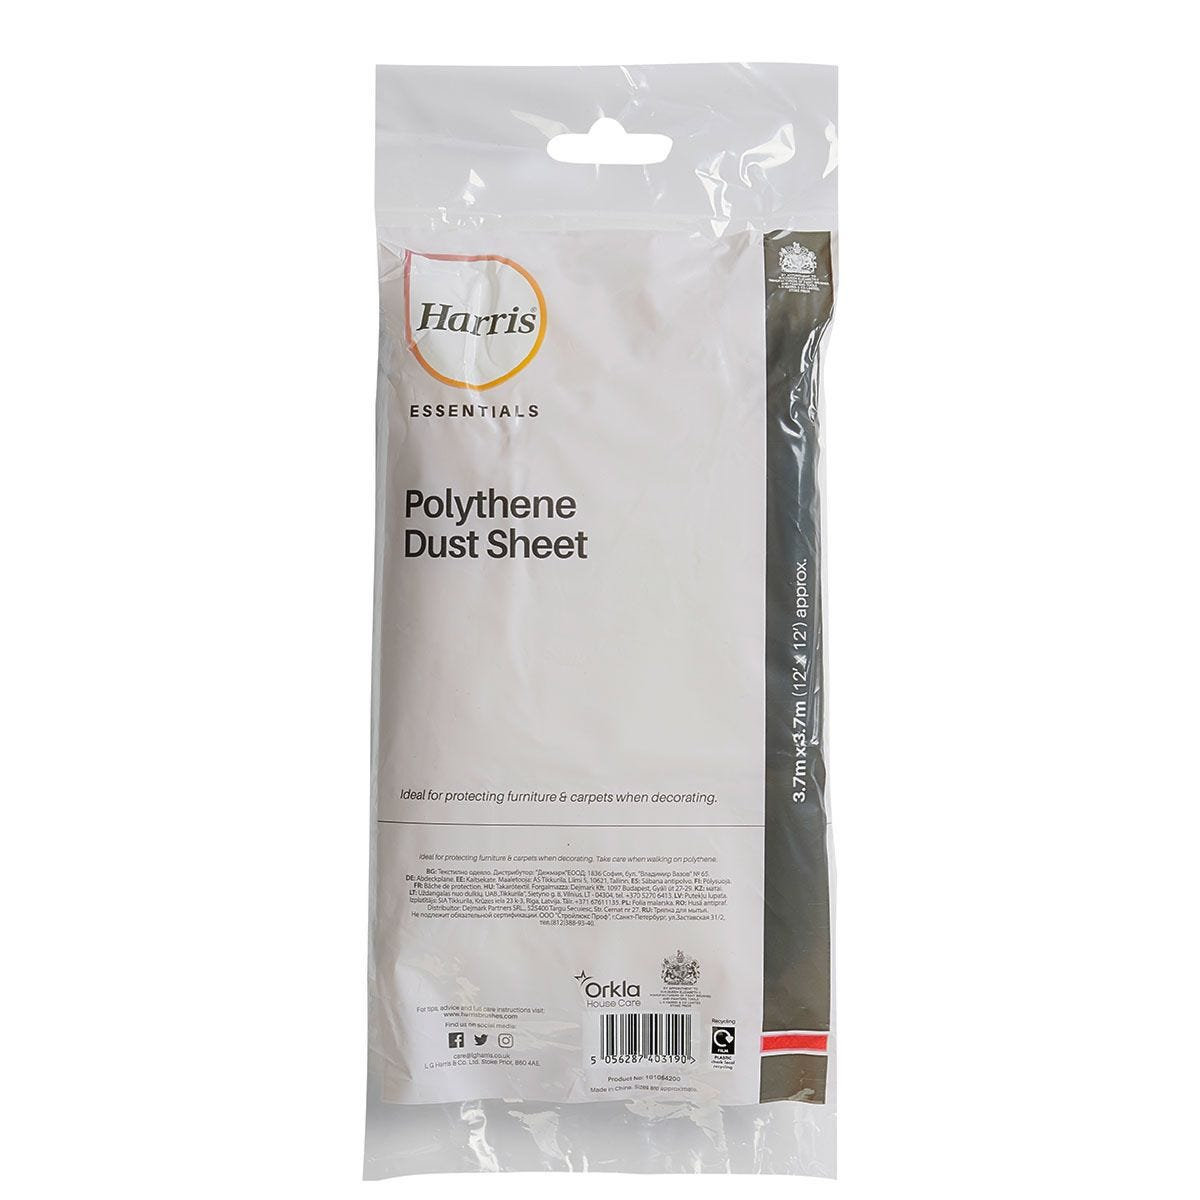 Harris Essentials Dust Sheet - 3.7m x 3.7m